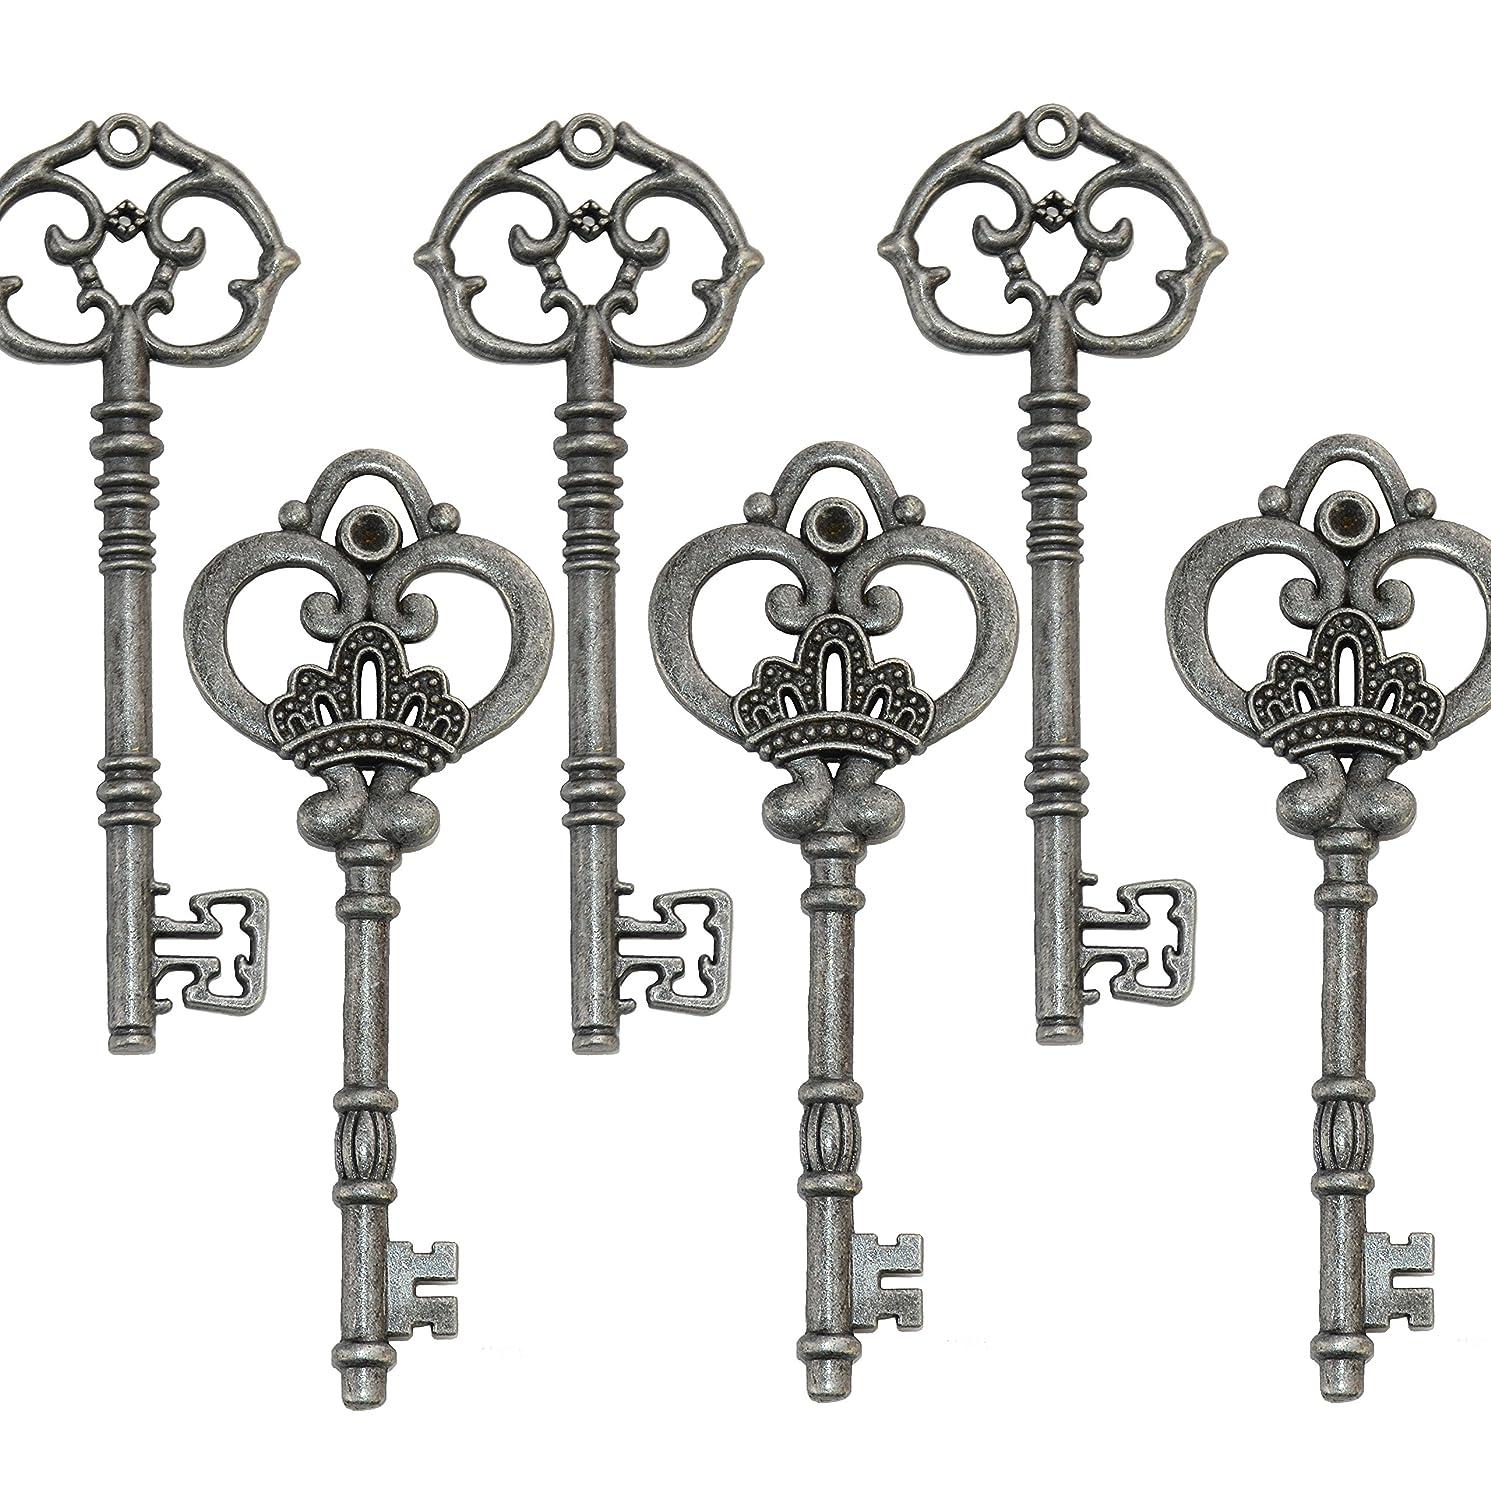 Mixed Set of 20 Extra Large Antique Pewter Skeleton Keys in Retro Rustic Style - Set of 20 Keys (Antique Pewter)